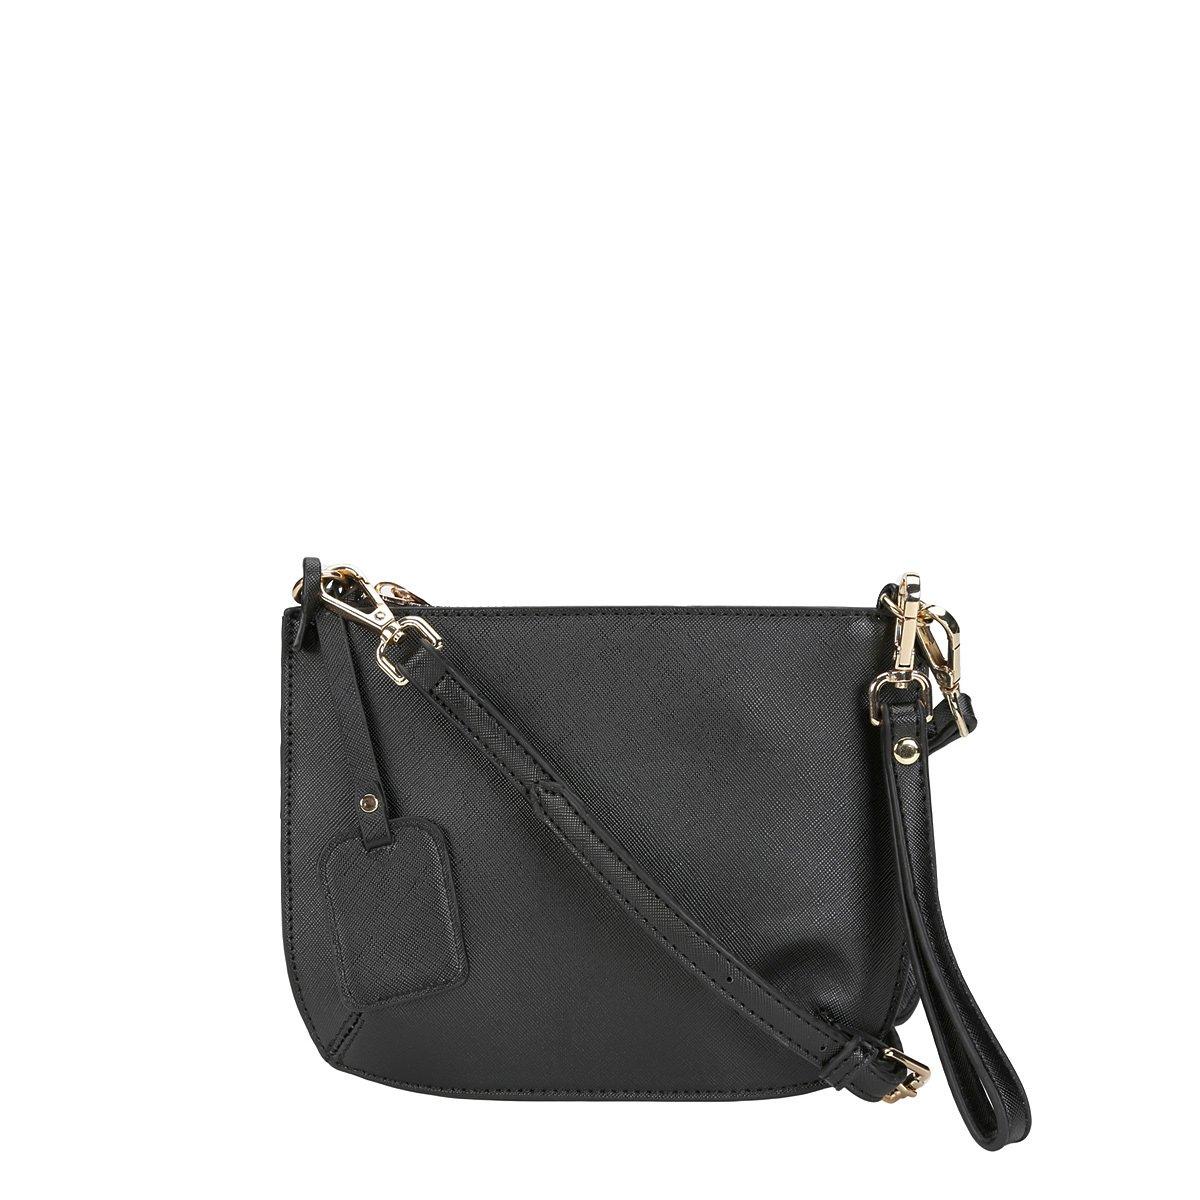 3c277a00f Bolsa Shoestock Mini Bag Transversal Básica Feminina   Shoestock